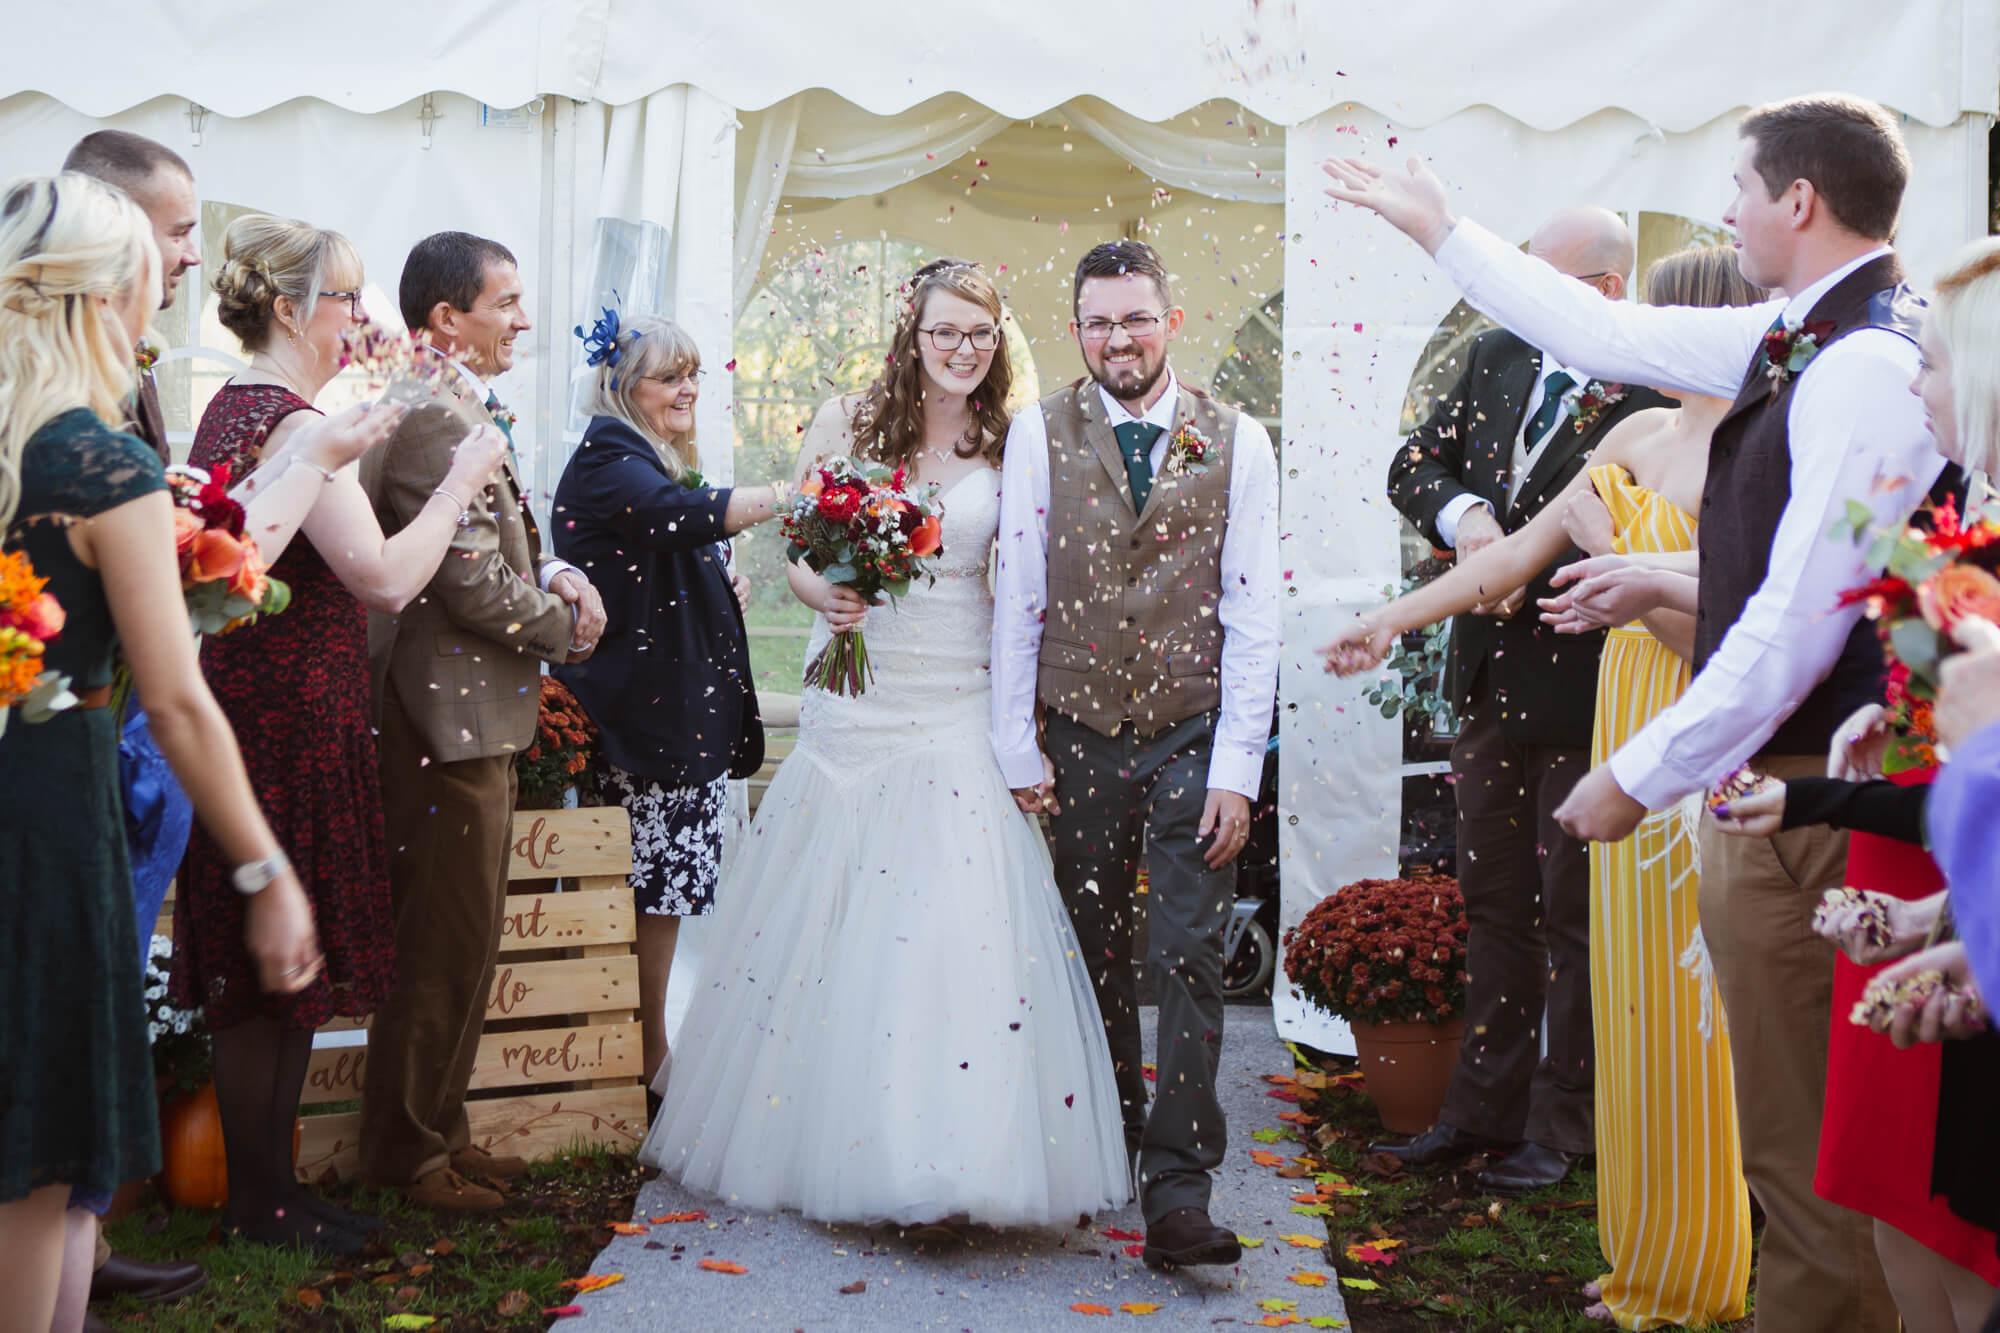 Salisbury wedding photographer, confetti, bride and groom